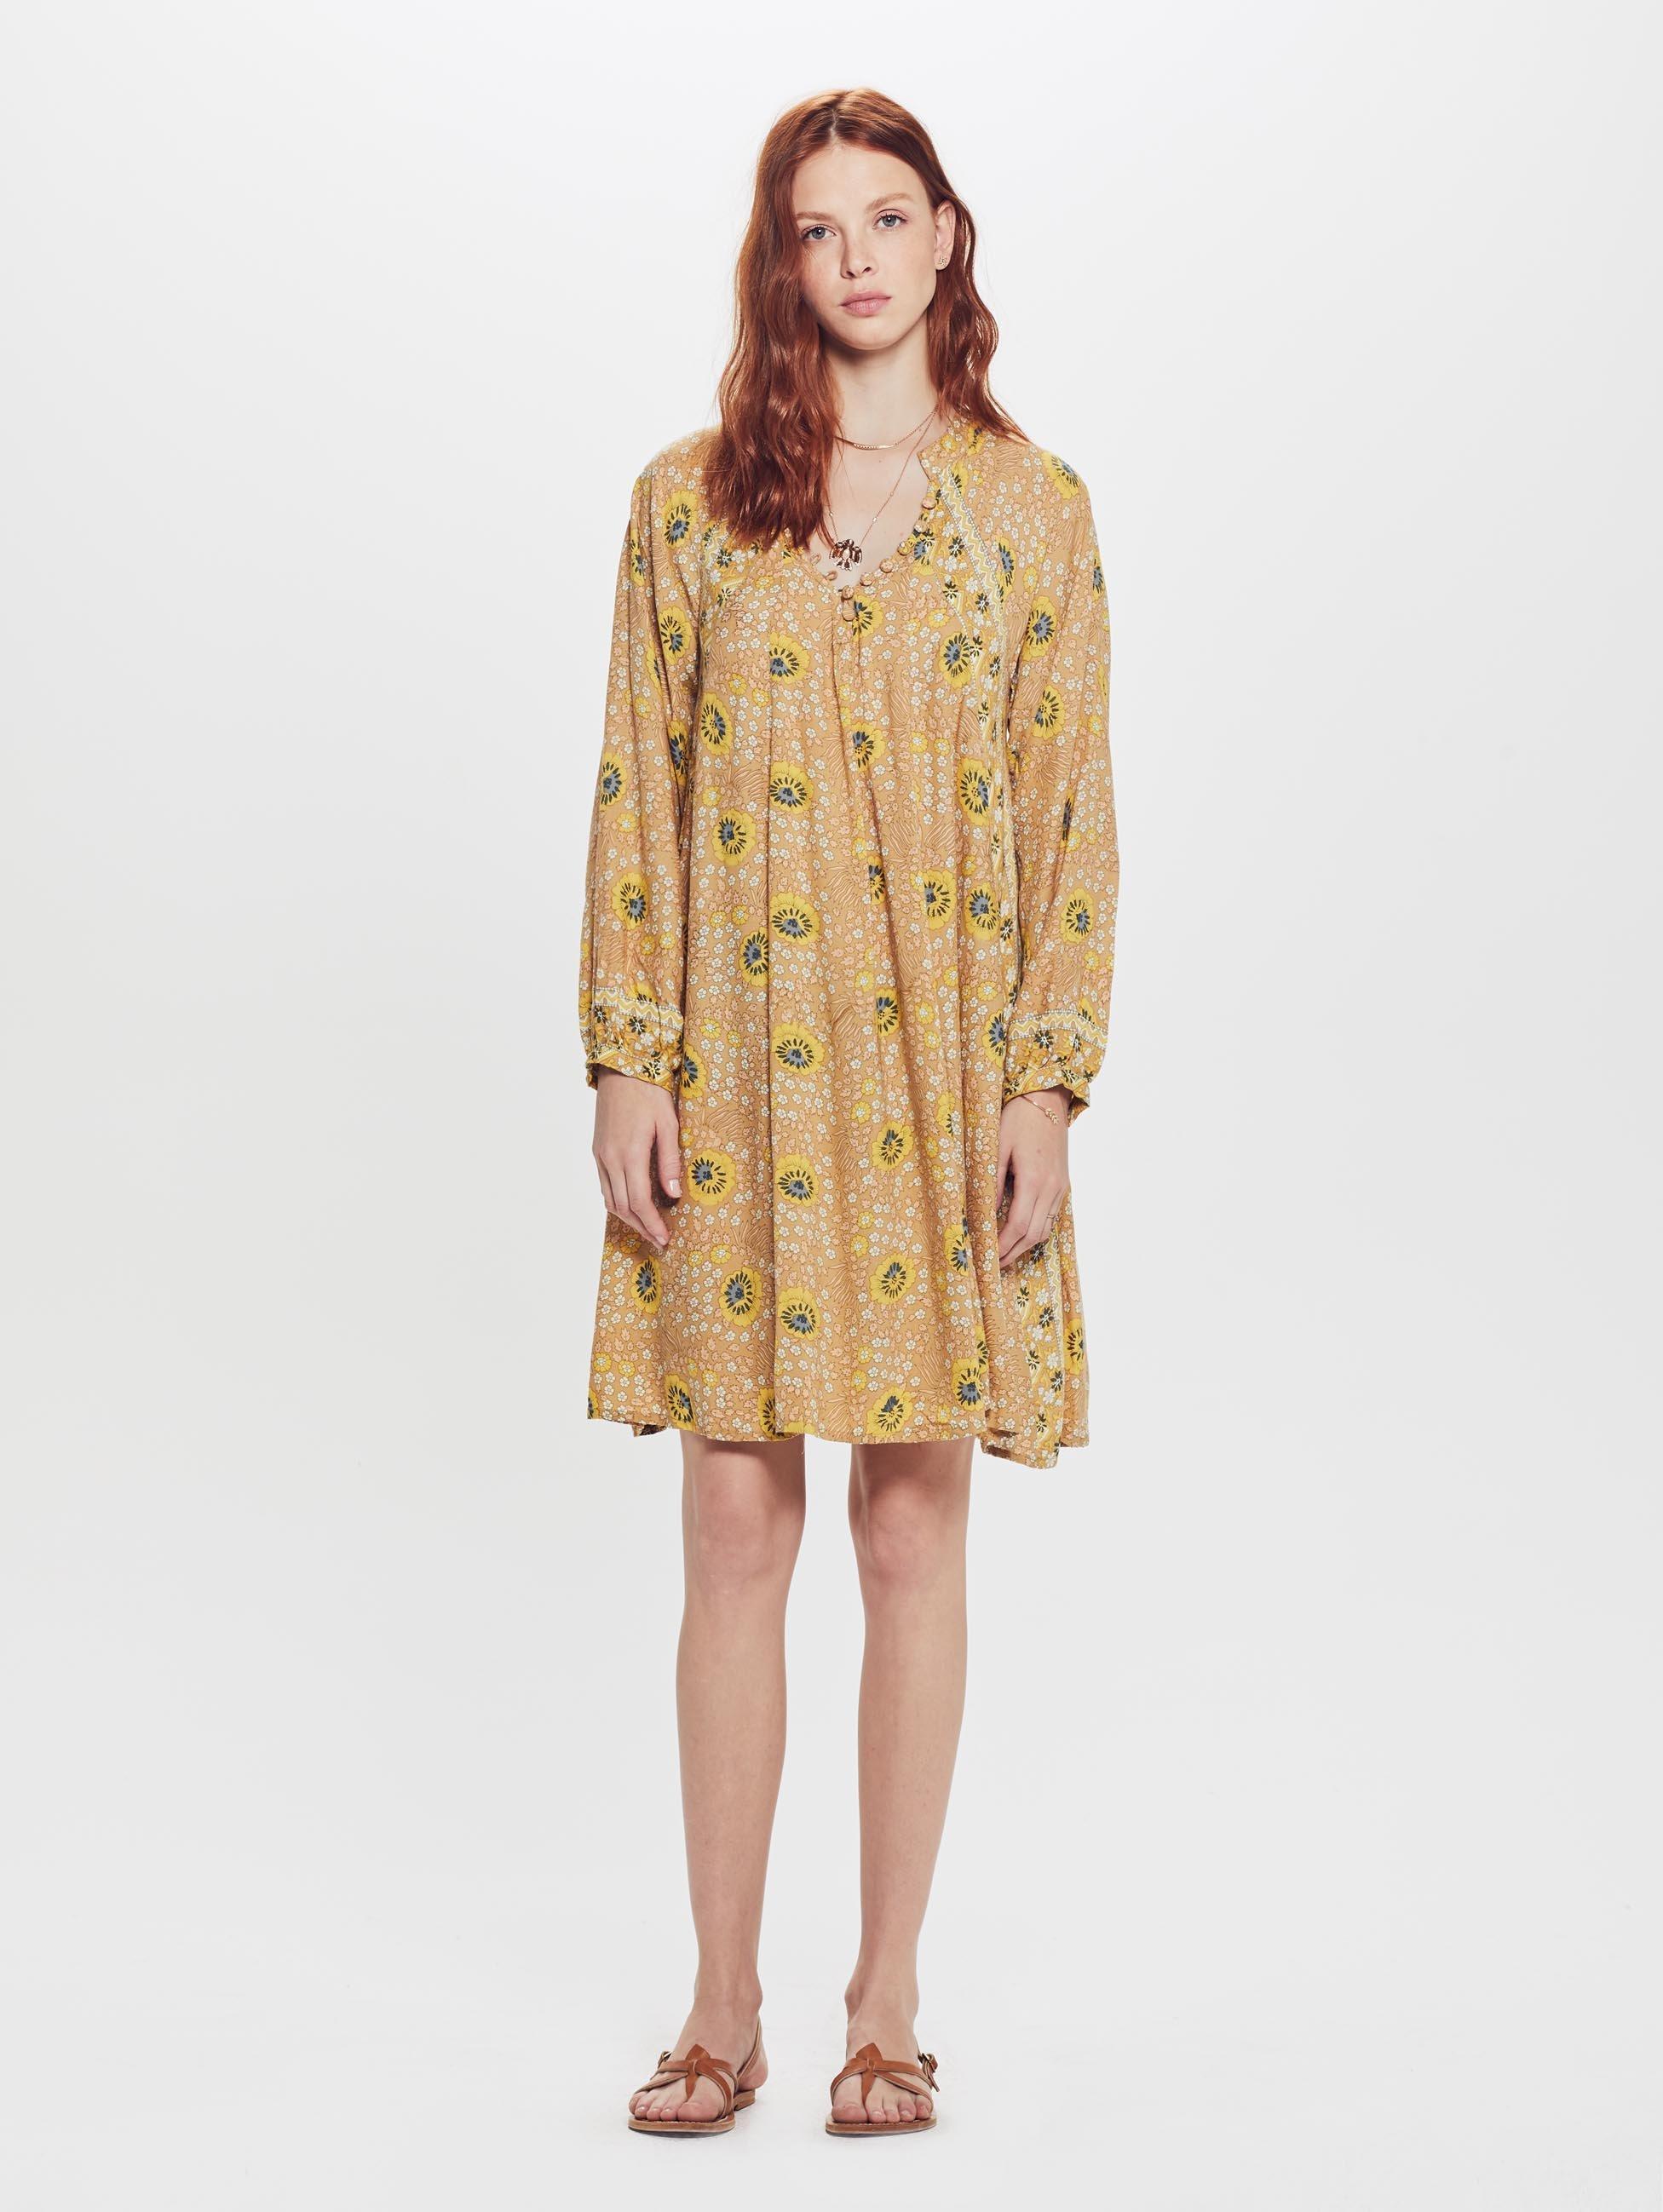 f0cd8490fdd Lyst - Natalie Martin Fiore Short Rayon Dress Vintage Flowers Gold in  Metallic